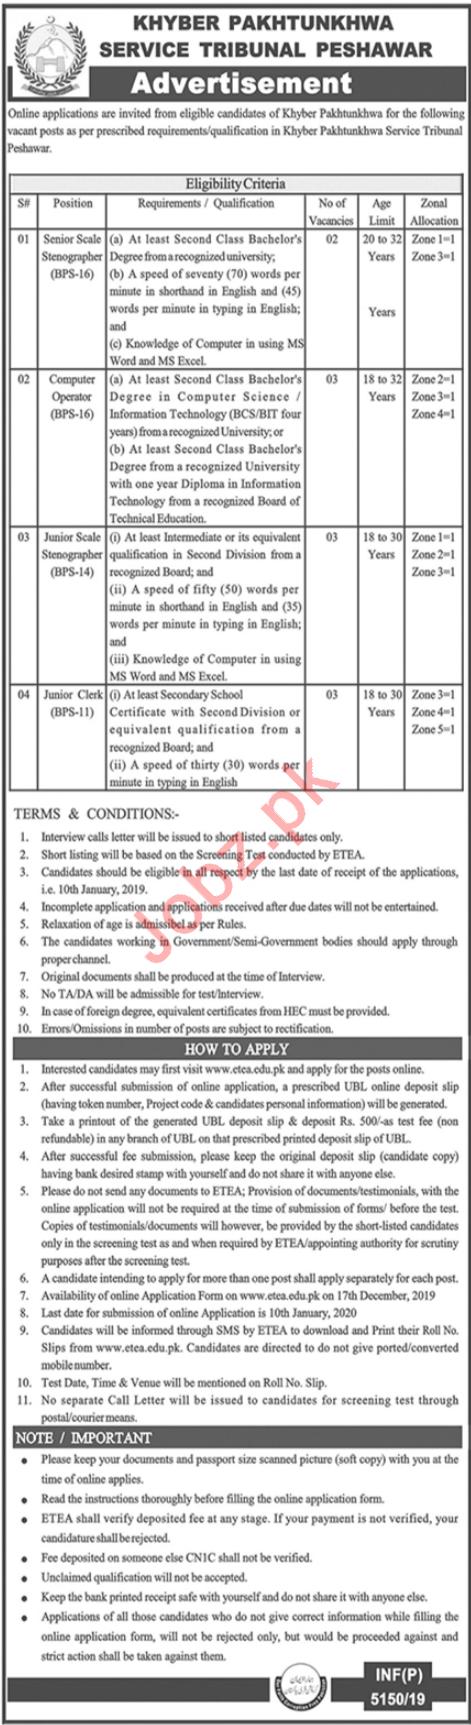 Khyber Pakhtunkhwa Service Tribunal Peshawar Jobs via ETEA